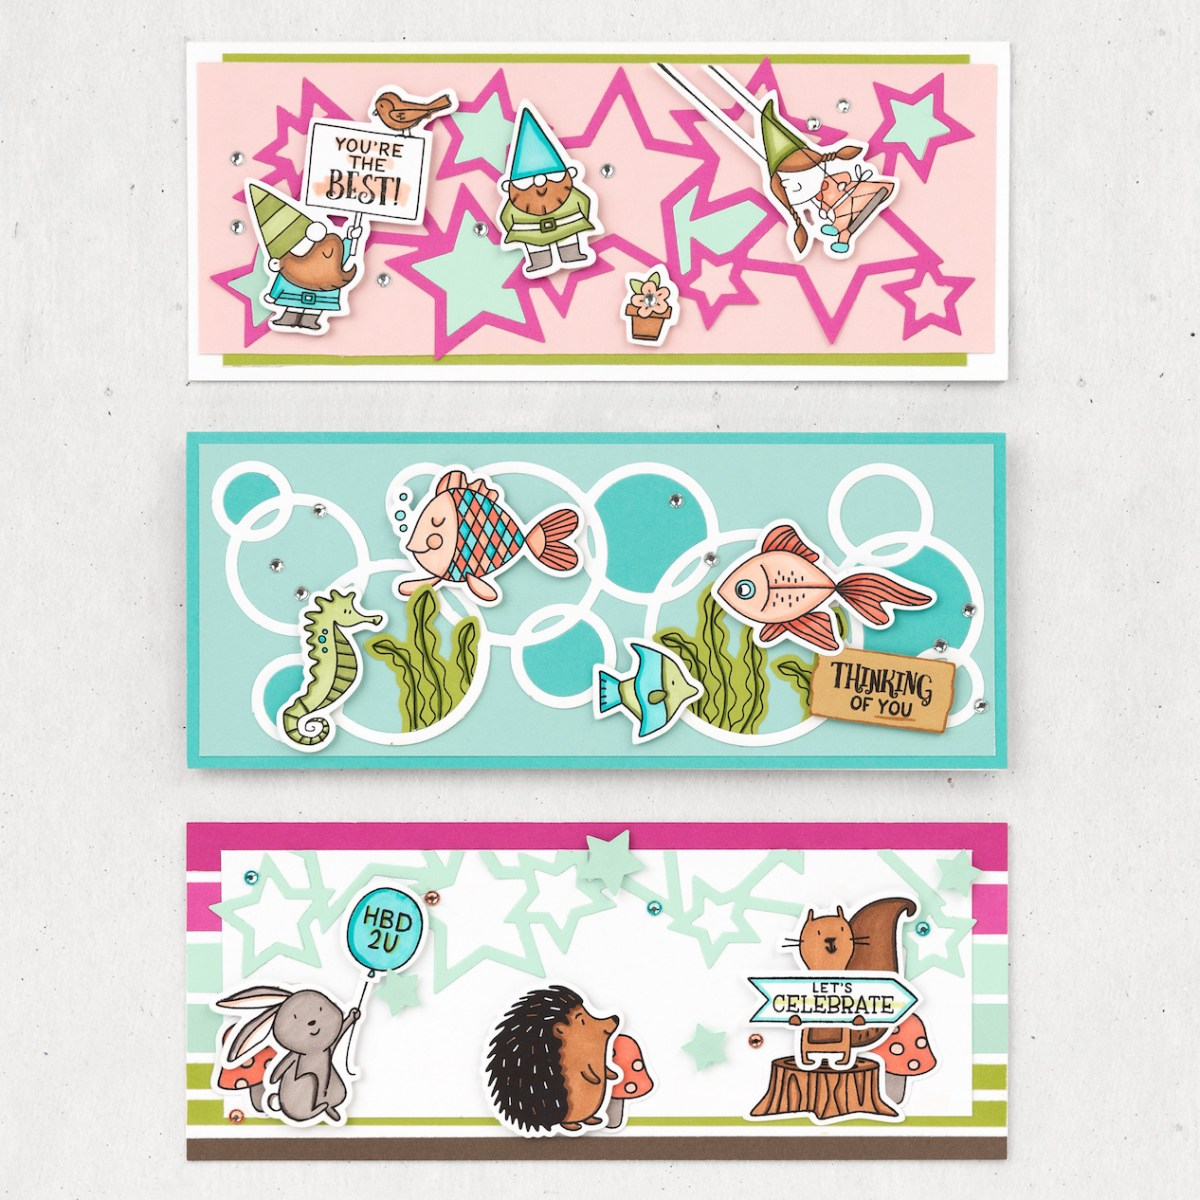 Slimline Cards #closetomyheart #ctmh #nationalstampingmonth #slimlinecelebration #slimlinecards #slimline #cardmaking #cardworkshop